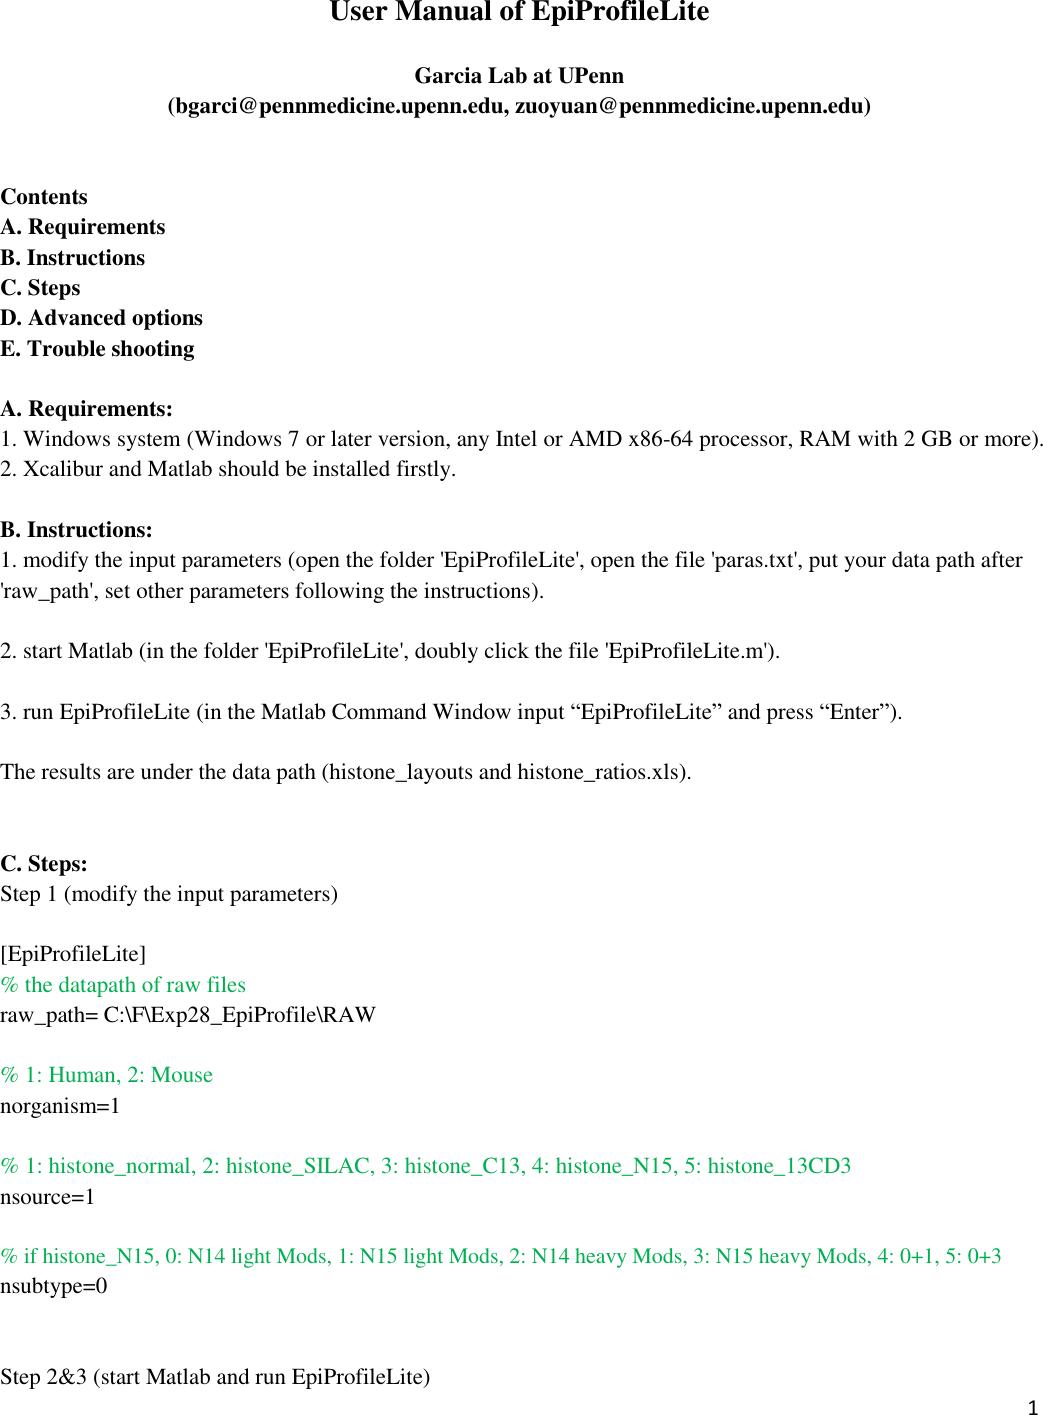 User Manual Of Epi Profile Lite